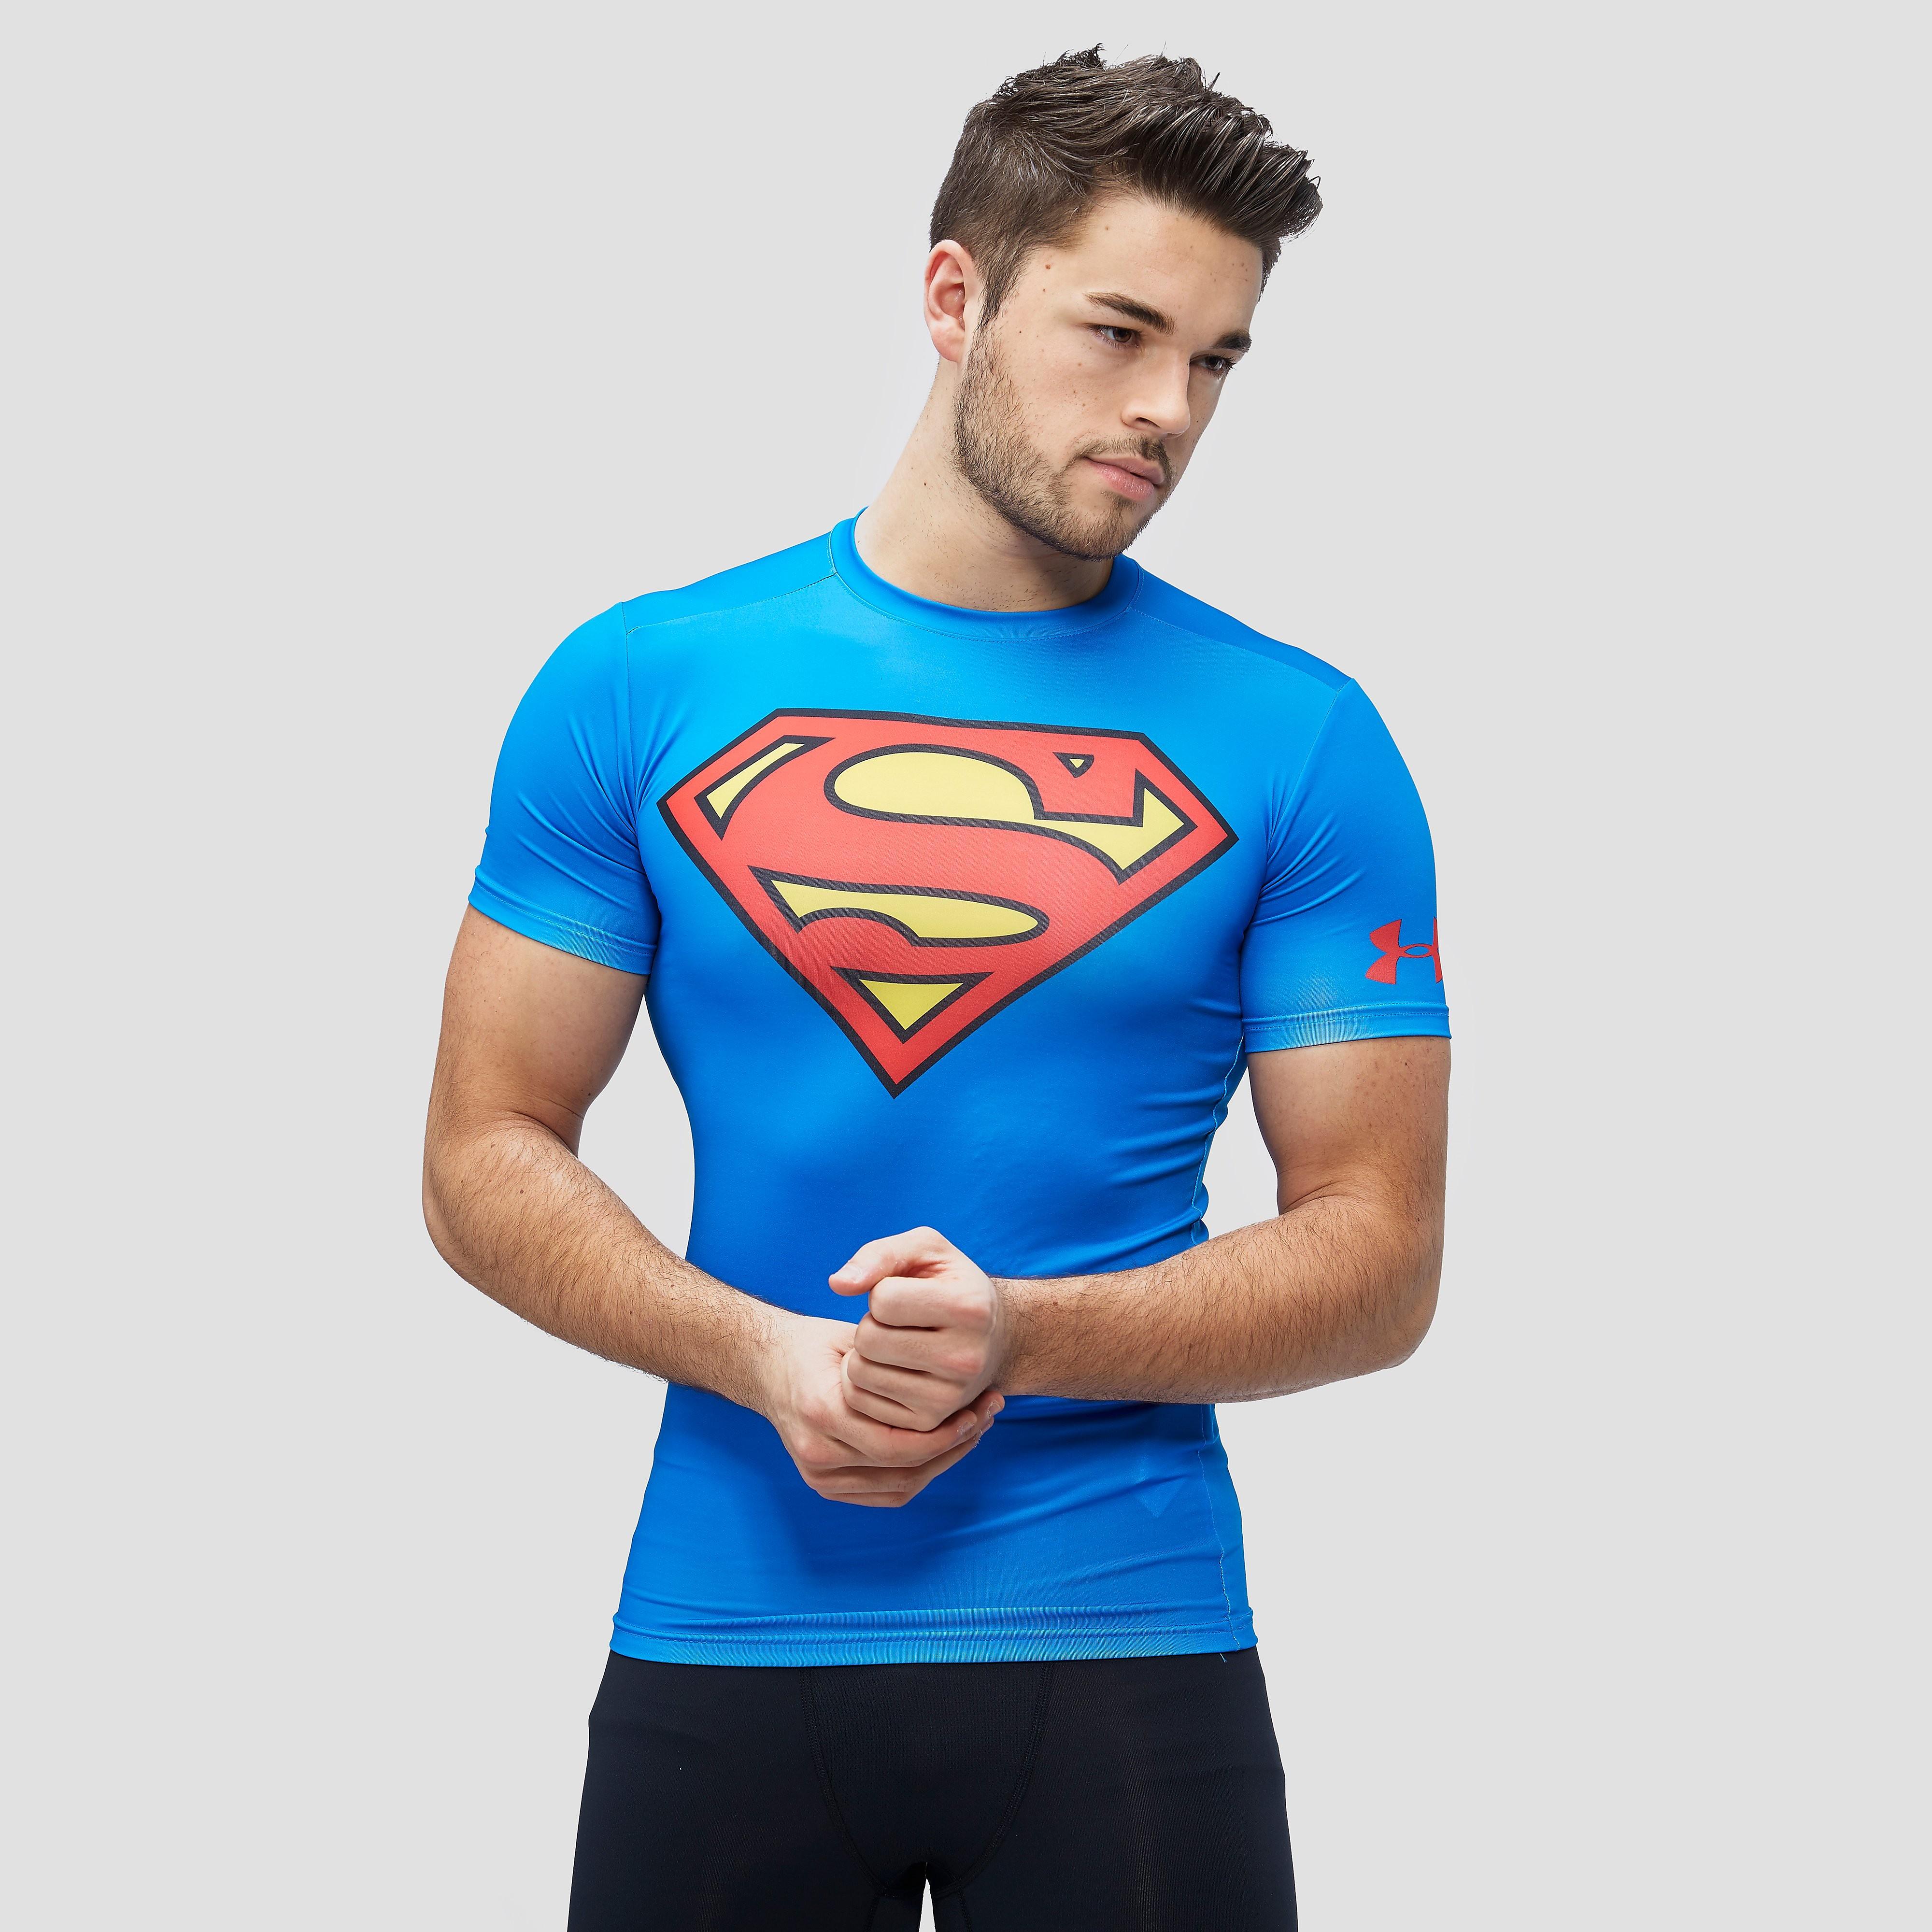 Under Armour Alter Ego Short Sleeve Compression Men's T-shirt